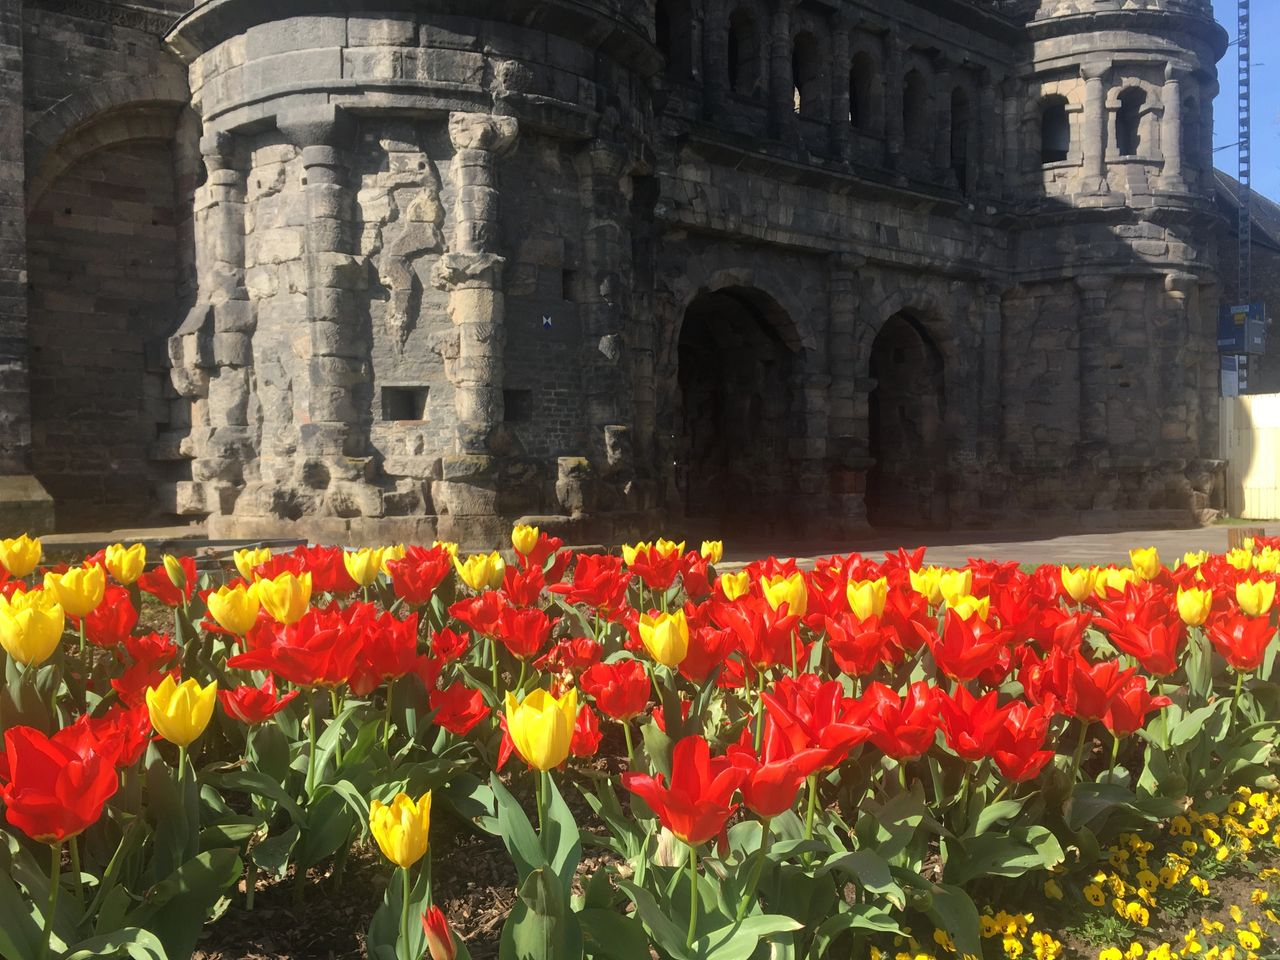 Tulips at the Porta Nigra in Trier, Germany